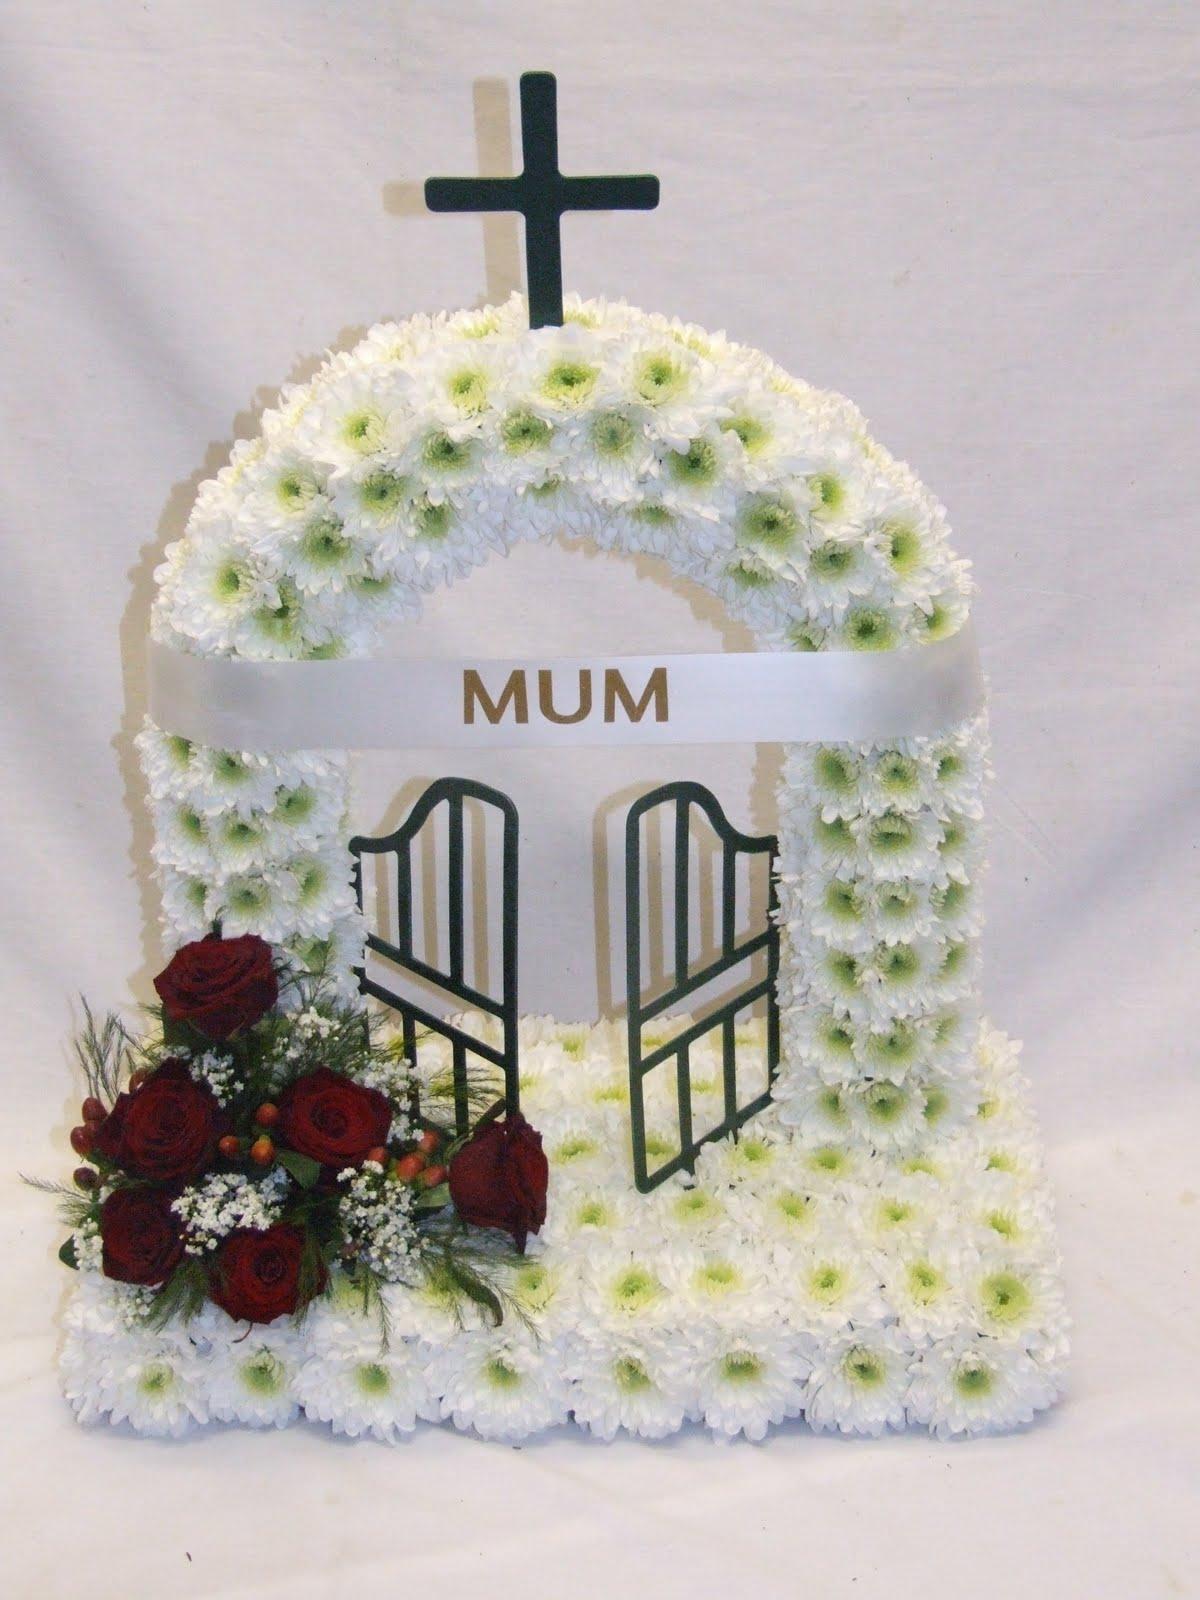 Rjs florist special funeral tributes rjs florist izmirmasajfo Choice Image